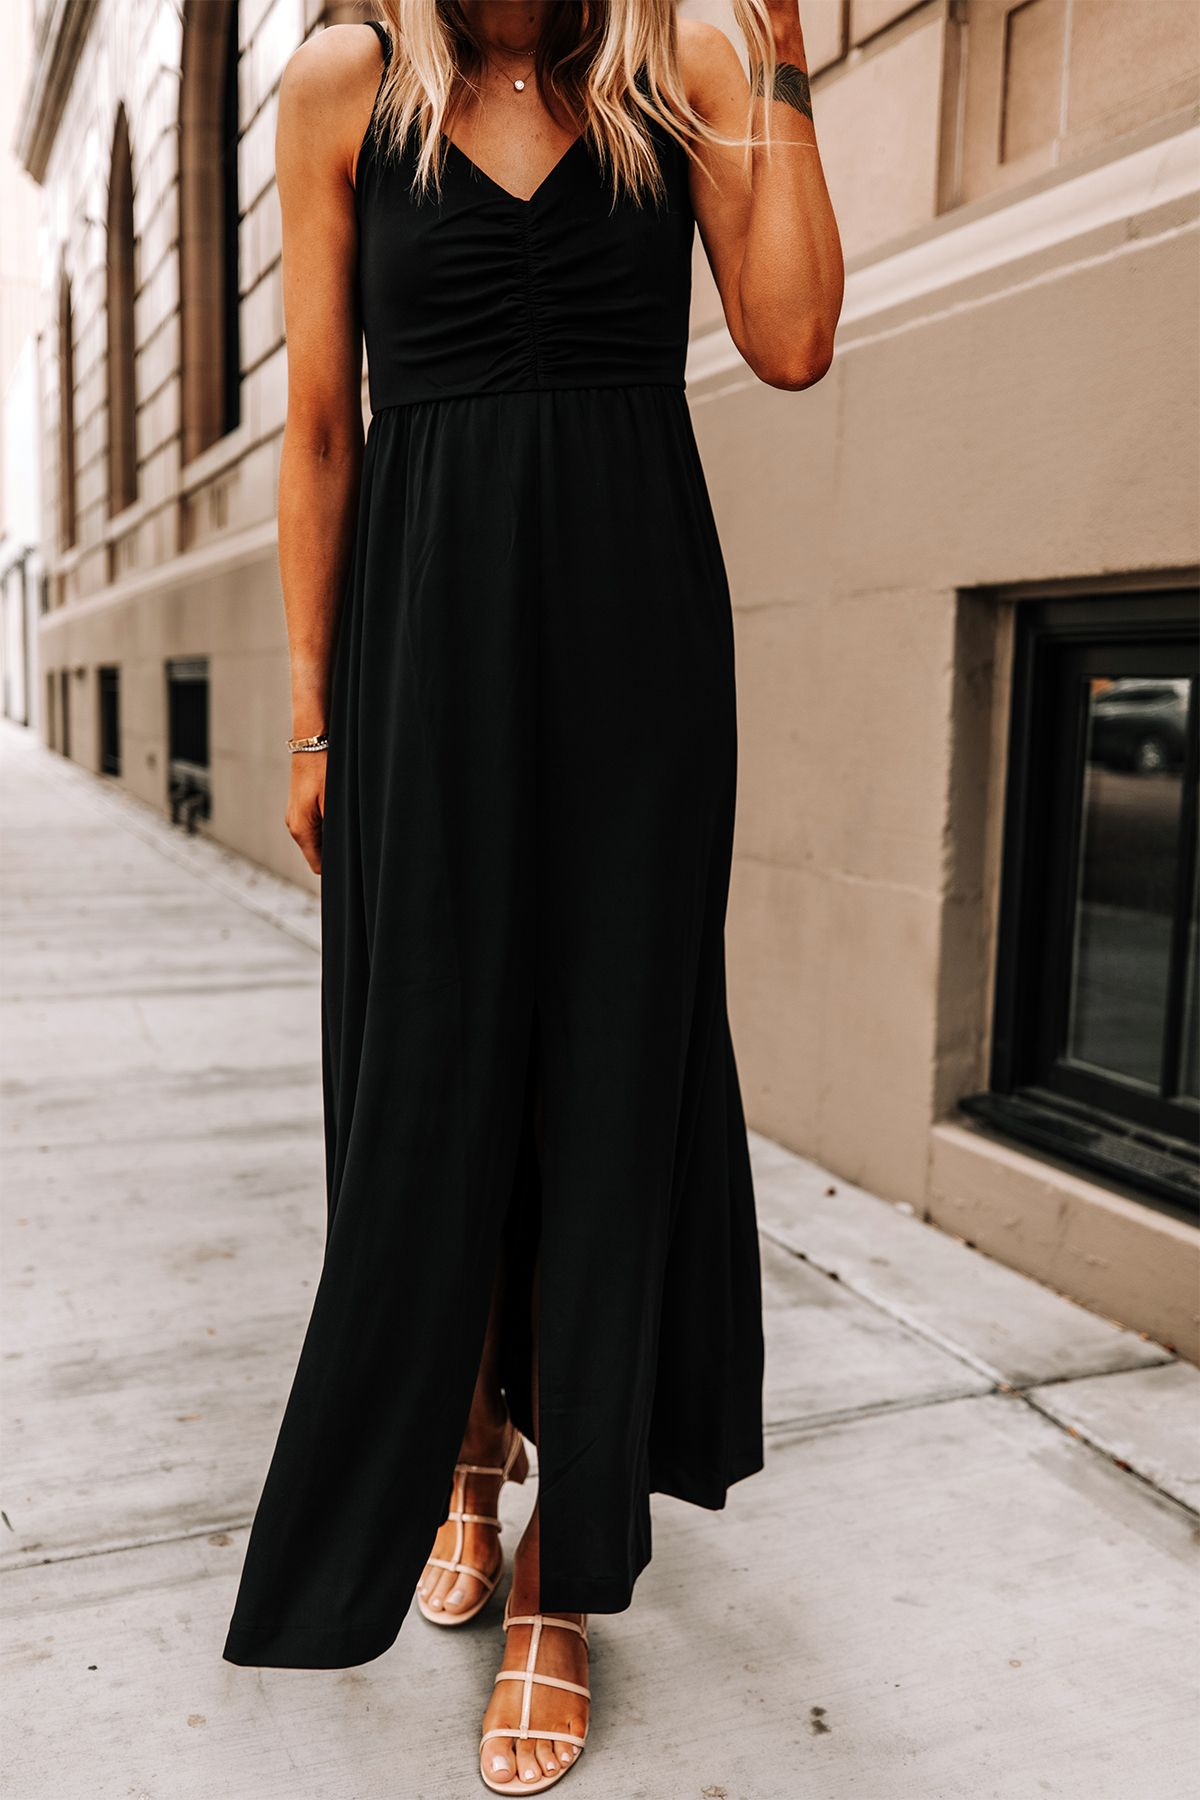 Fashion Jackson Wearing Banana Republic Black Maxi Dress Tan Sandals 2 Summer Dresses Casual Summer Dresses Casual Dress Outfits [ 1800 x 1200 Pixel ]